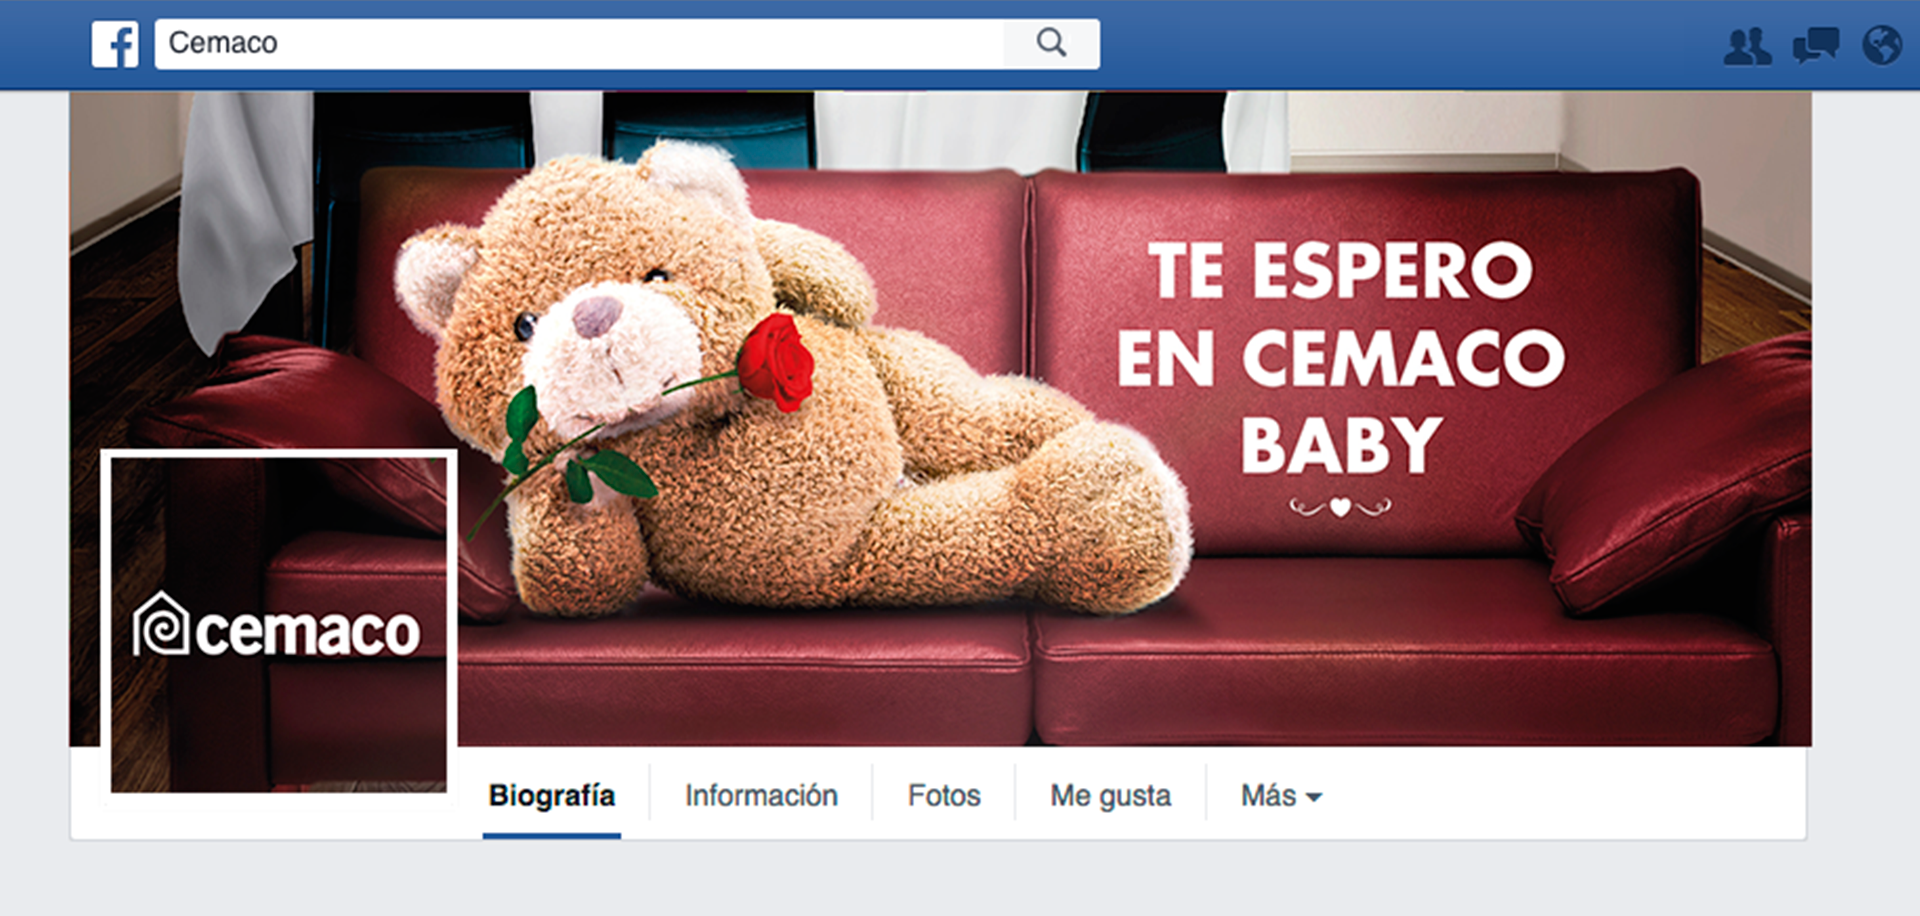 Baby te espero en Cemaco